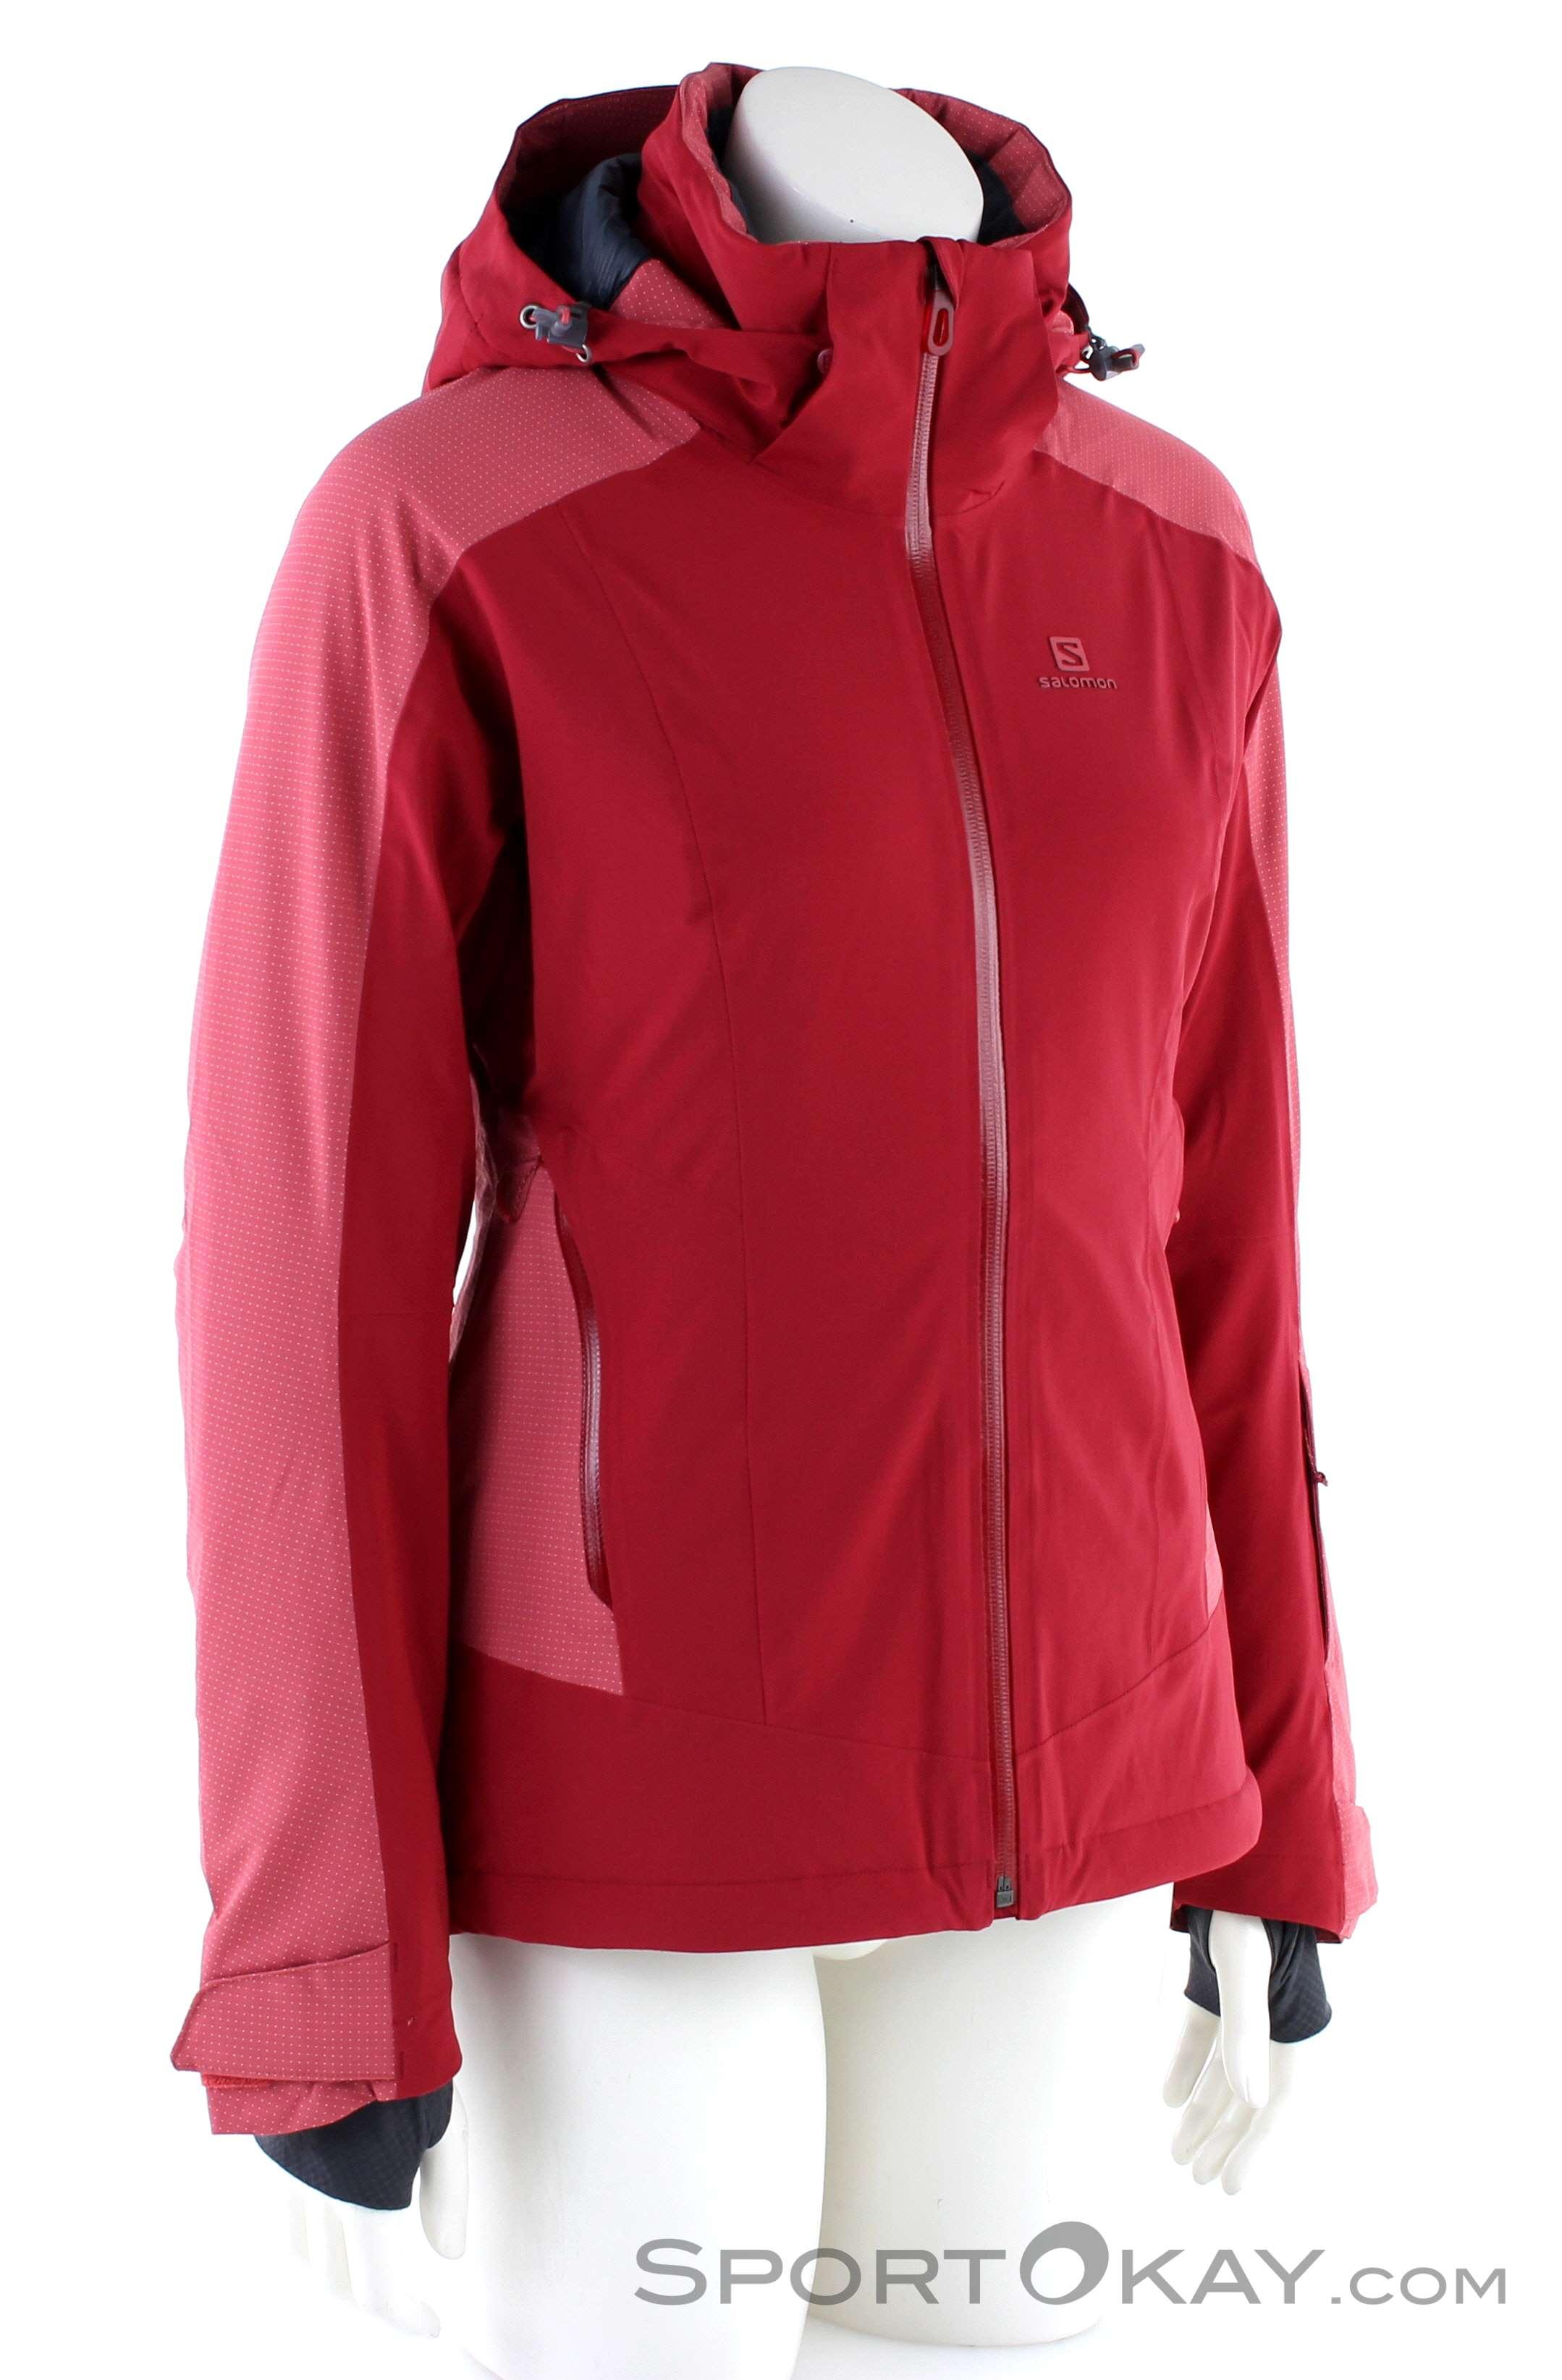 Salomon Salomon Brilliant Jacket Womens Ski Jacket